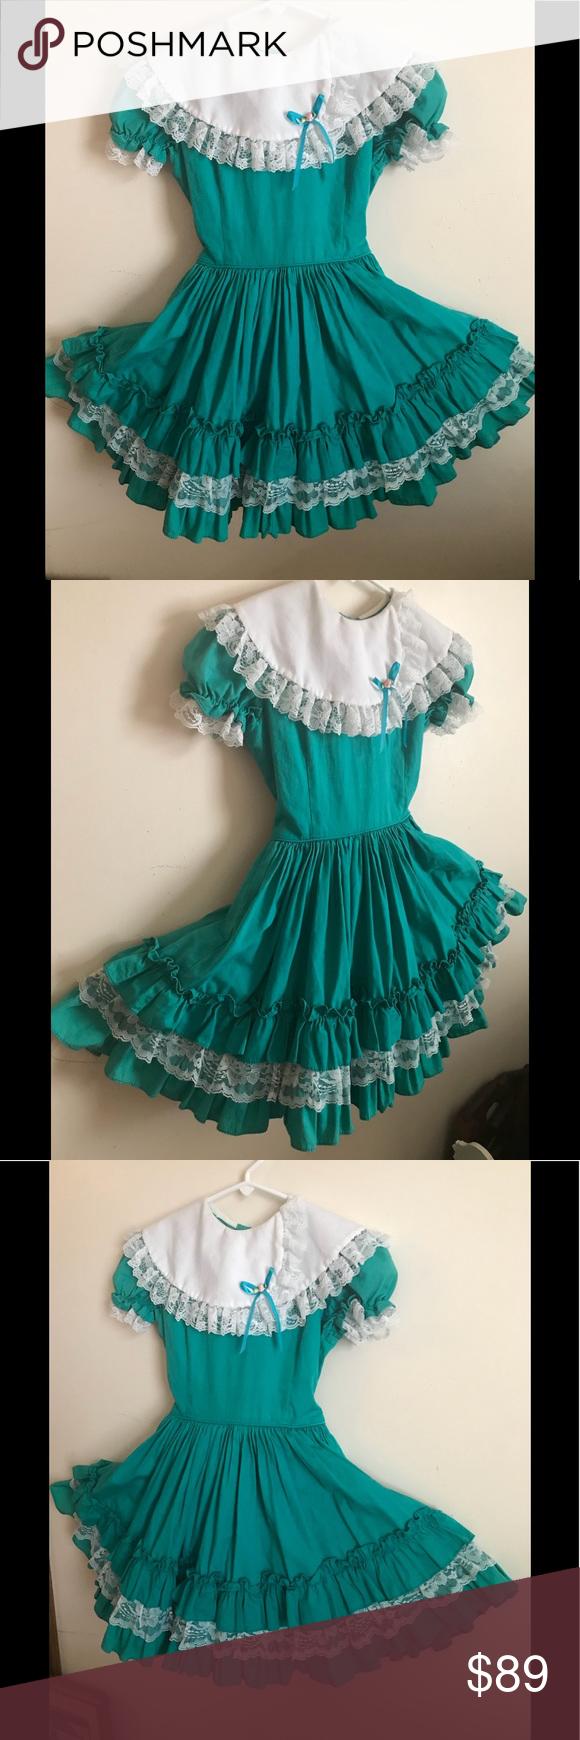 5c37bd29d80ff Rare Vintage 1970's Original Lidl Dolly's Dress Gorgeous Rare Vintage  1970's Original Lidl Dolly's Southern Belle